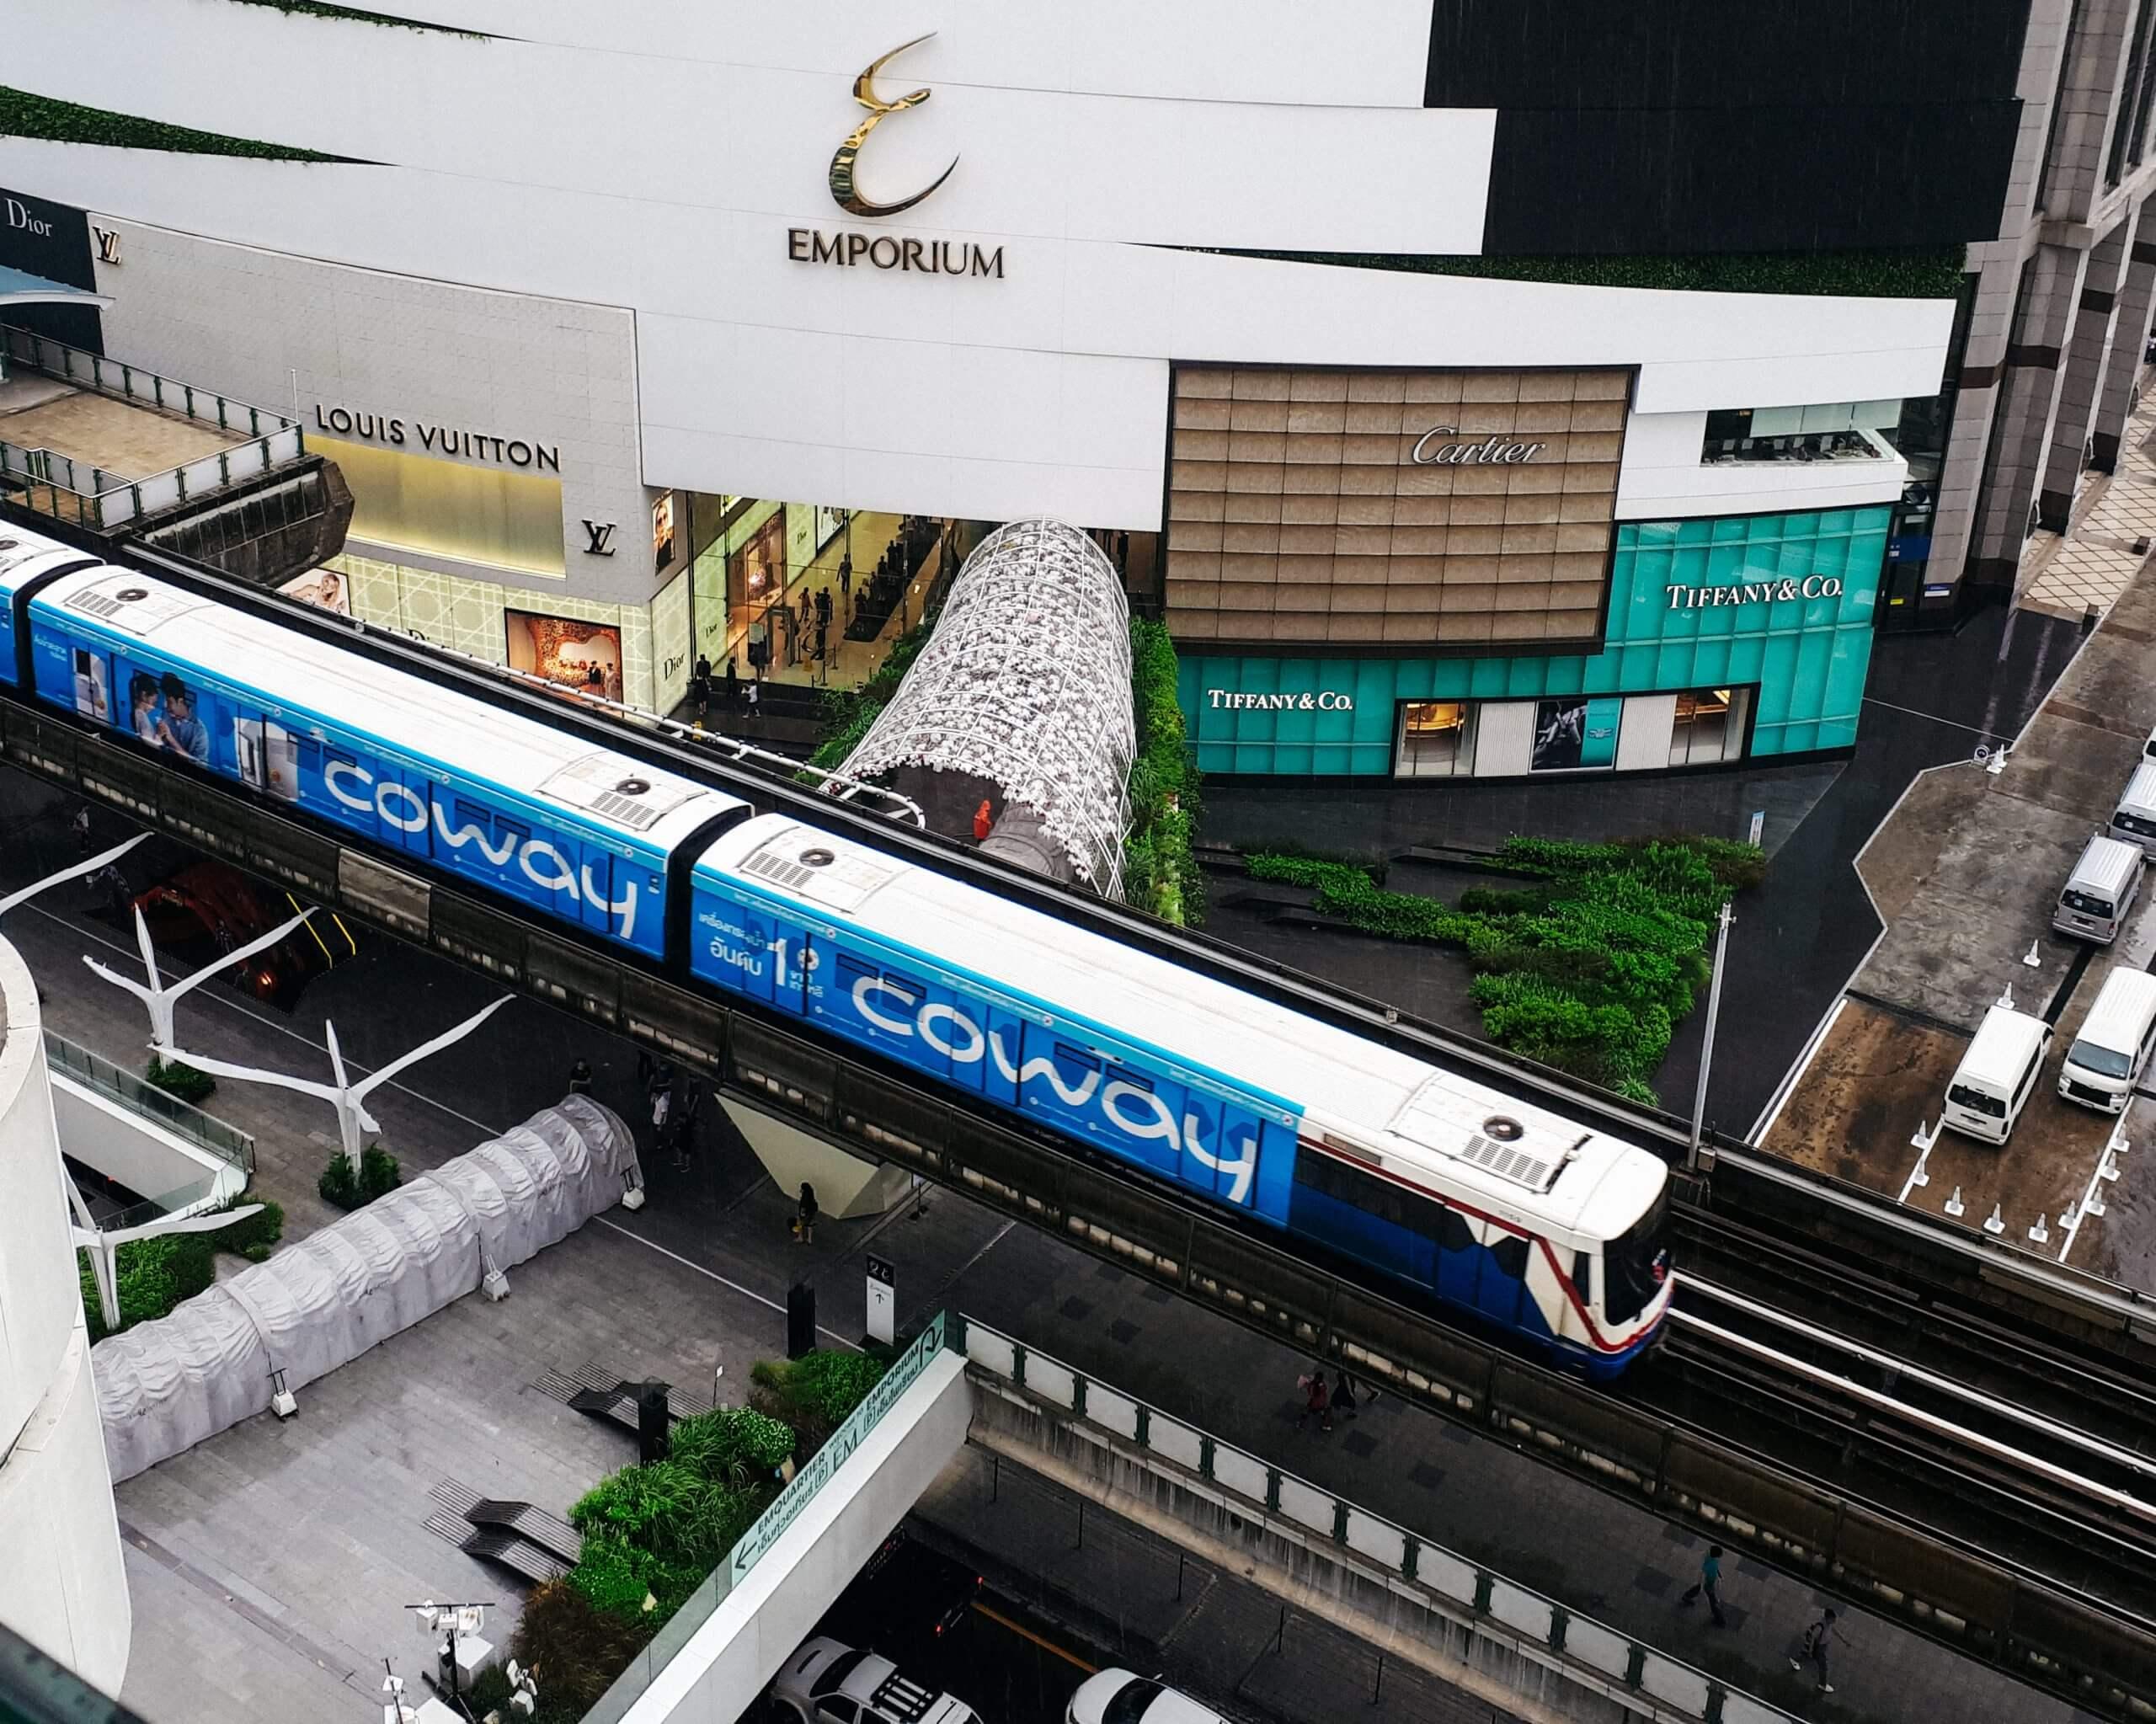 The BTS skytrain as transport in Bangkok Thailand